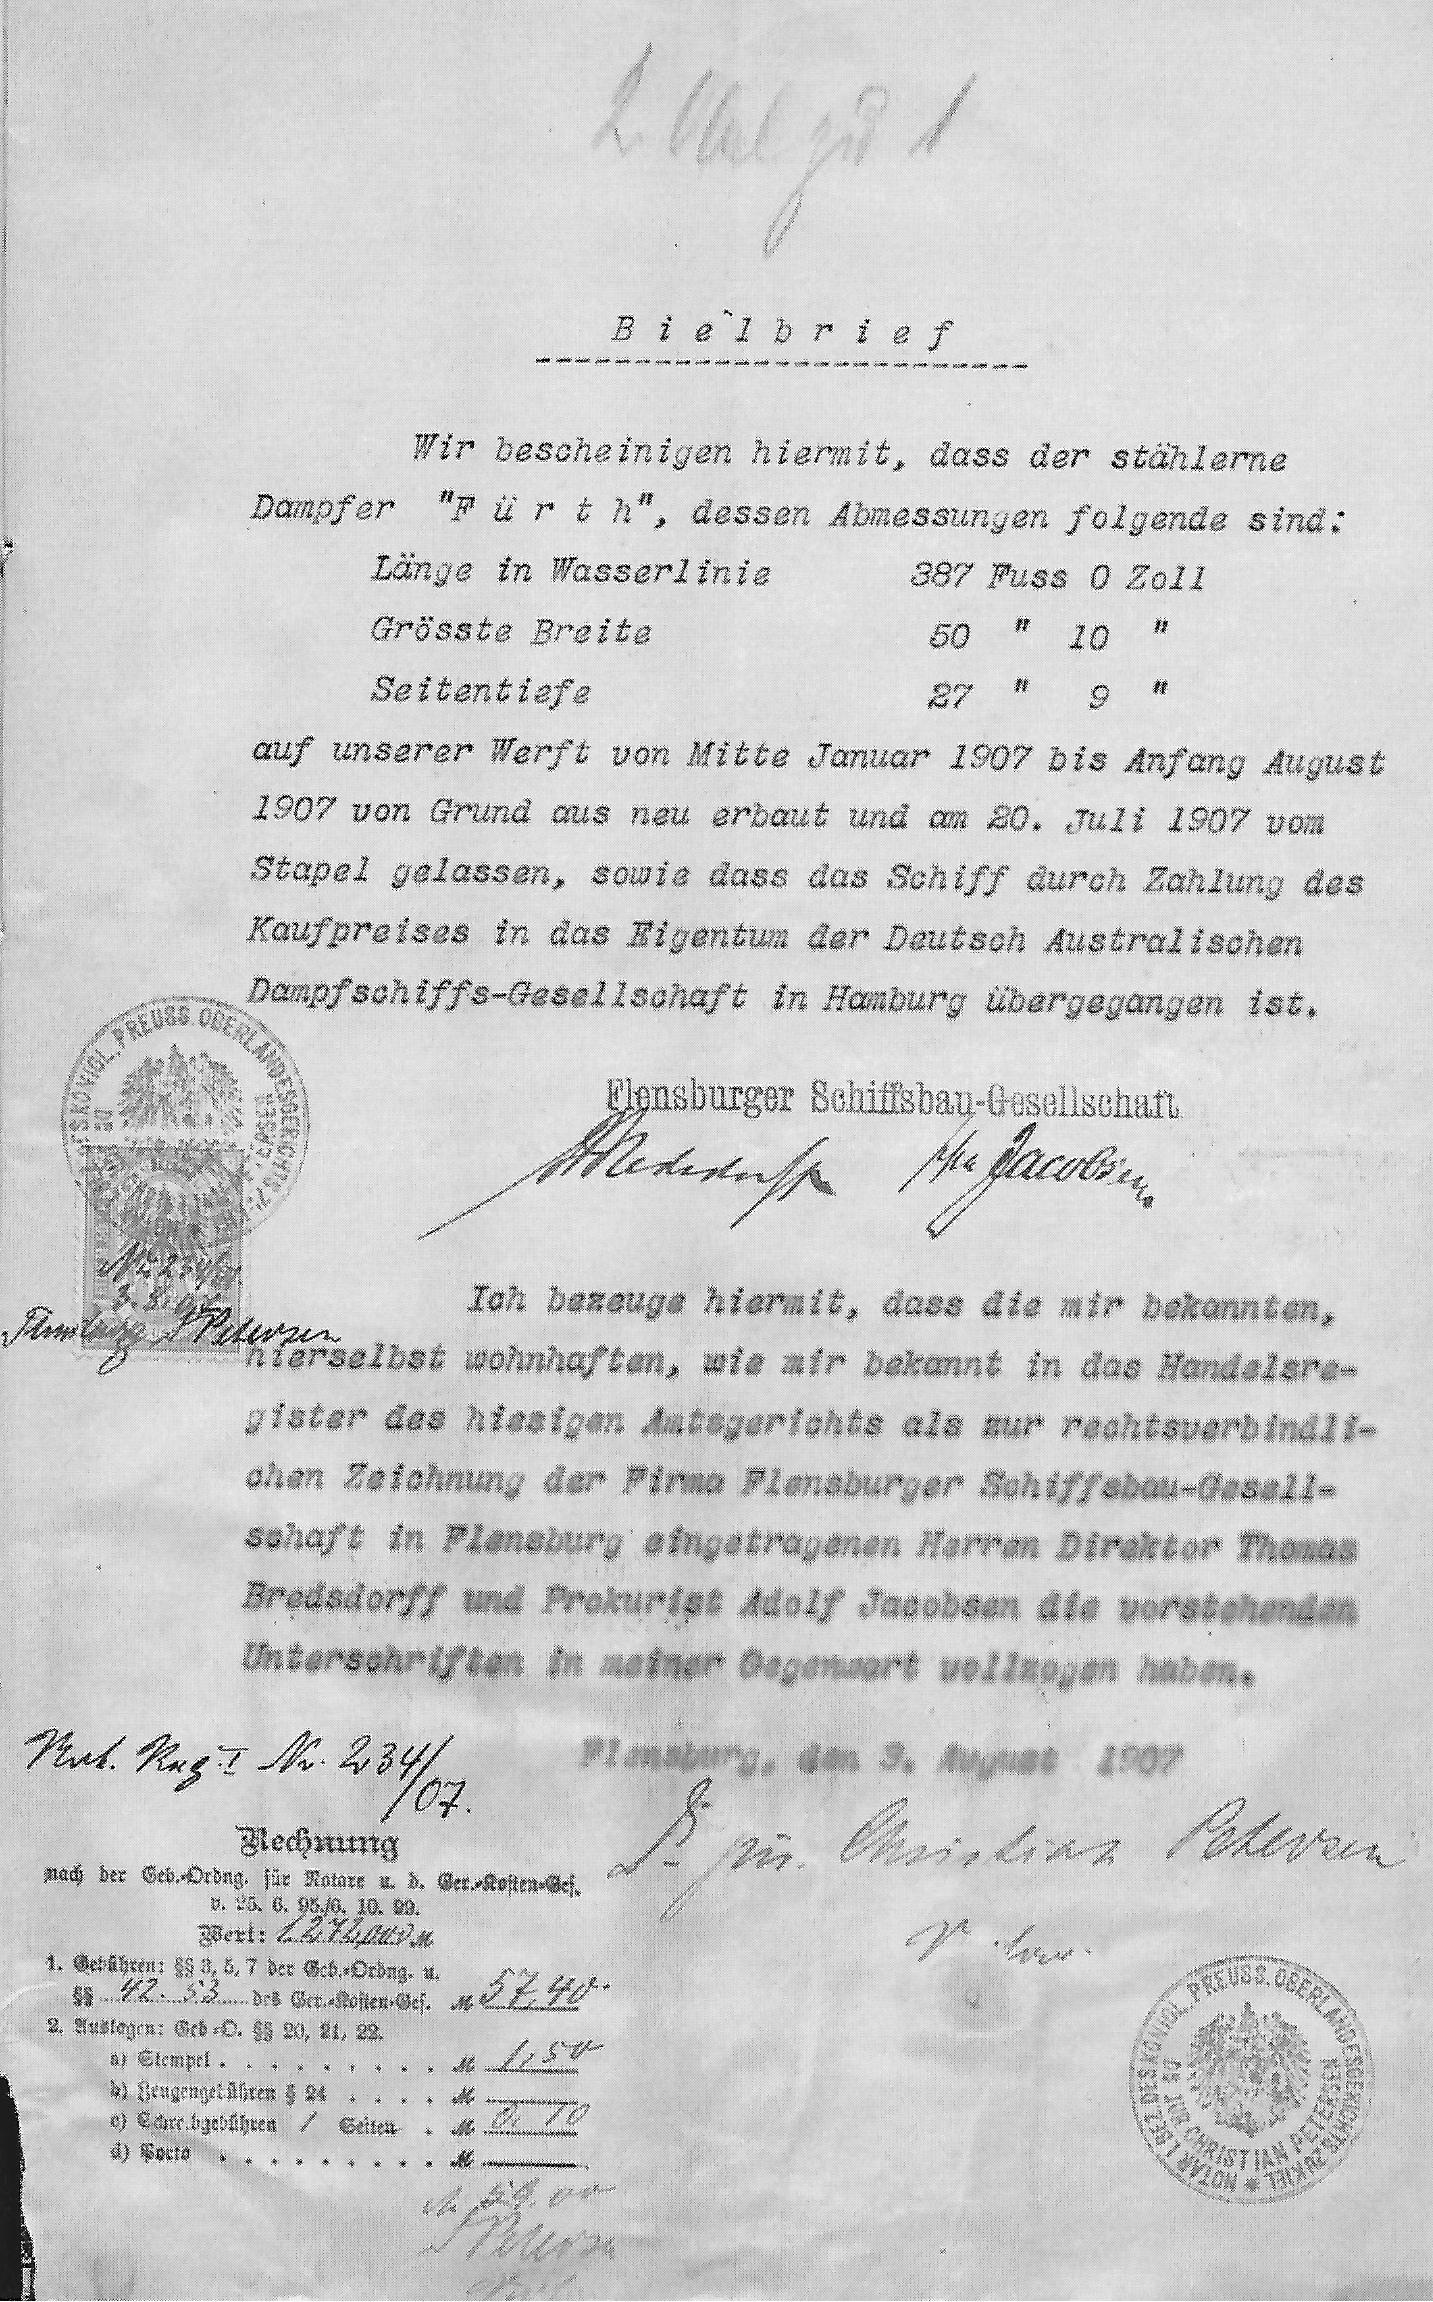 steam ship Furth, Bielbrief, registration documents, Hamburg